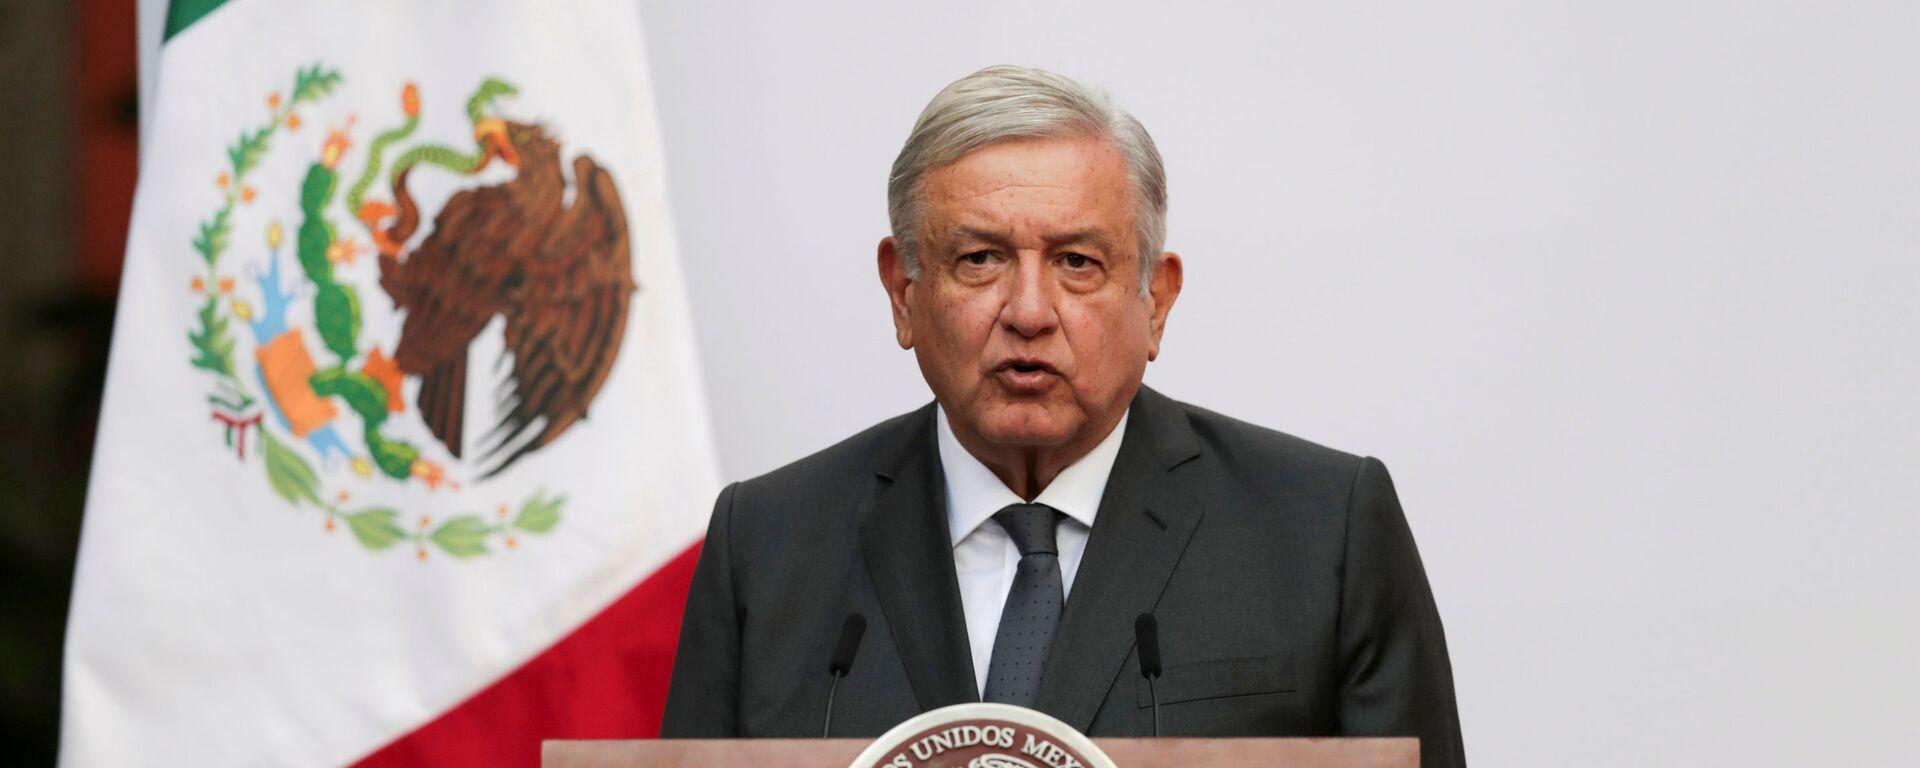 Andrés Manuel López Obrador, presidente mexicano - Sputnik Mundo, 1920, 10.02.2021